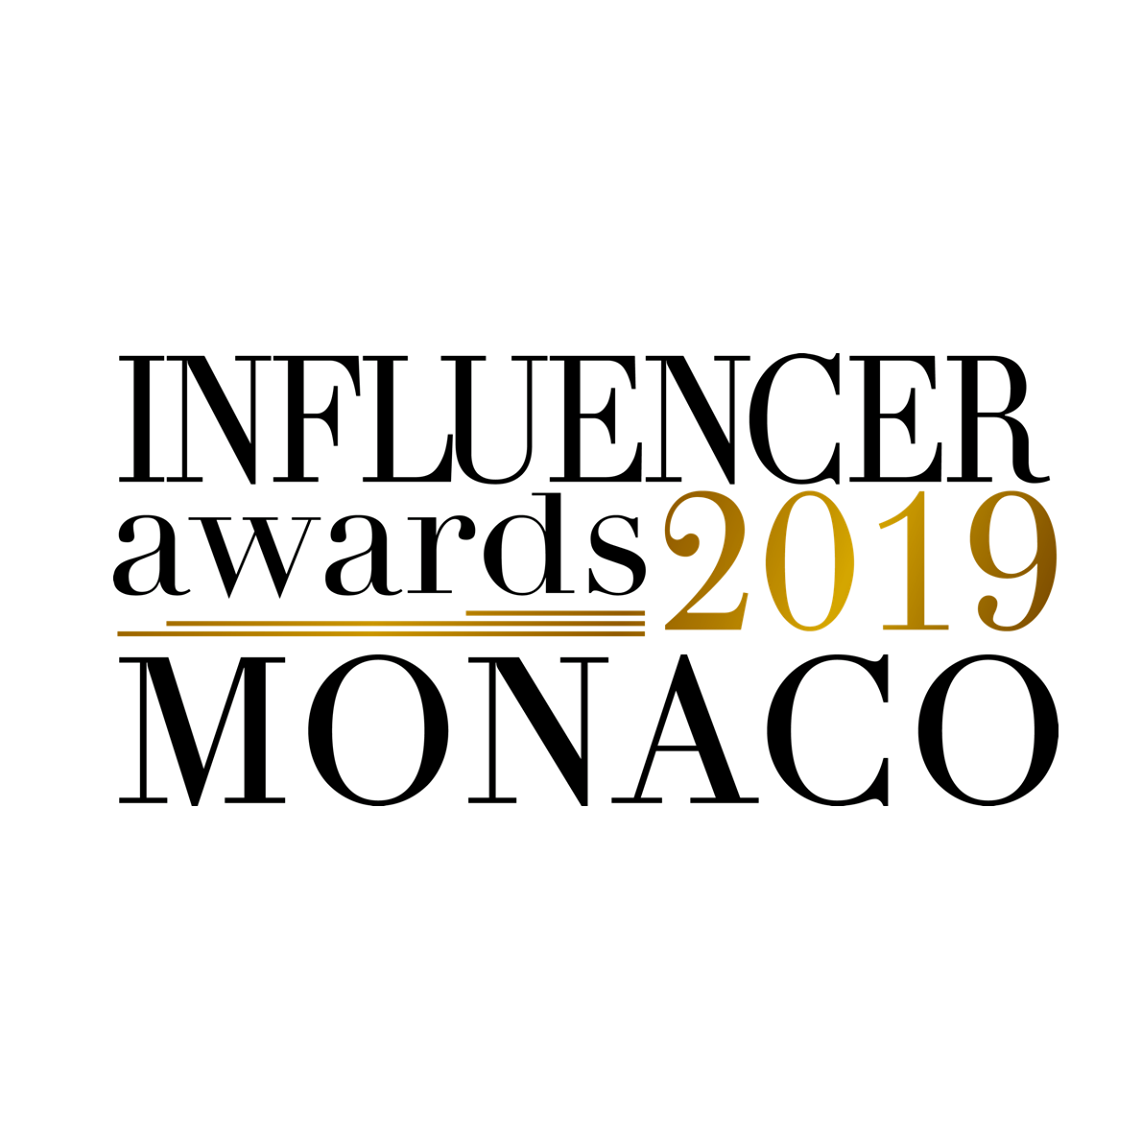 Influencer Awards Monaco